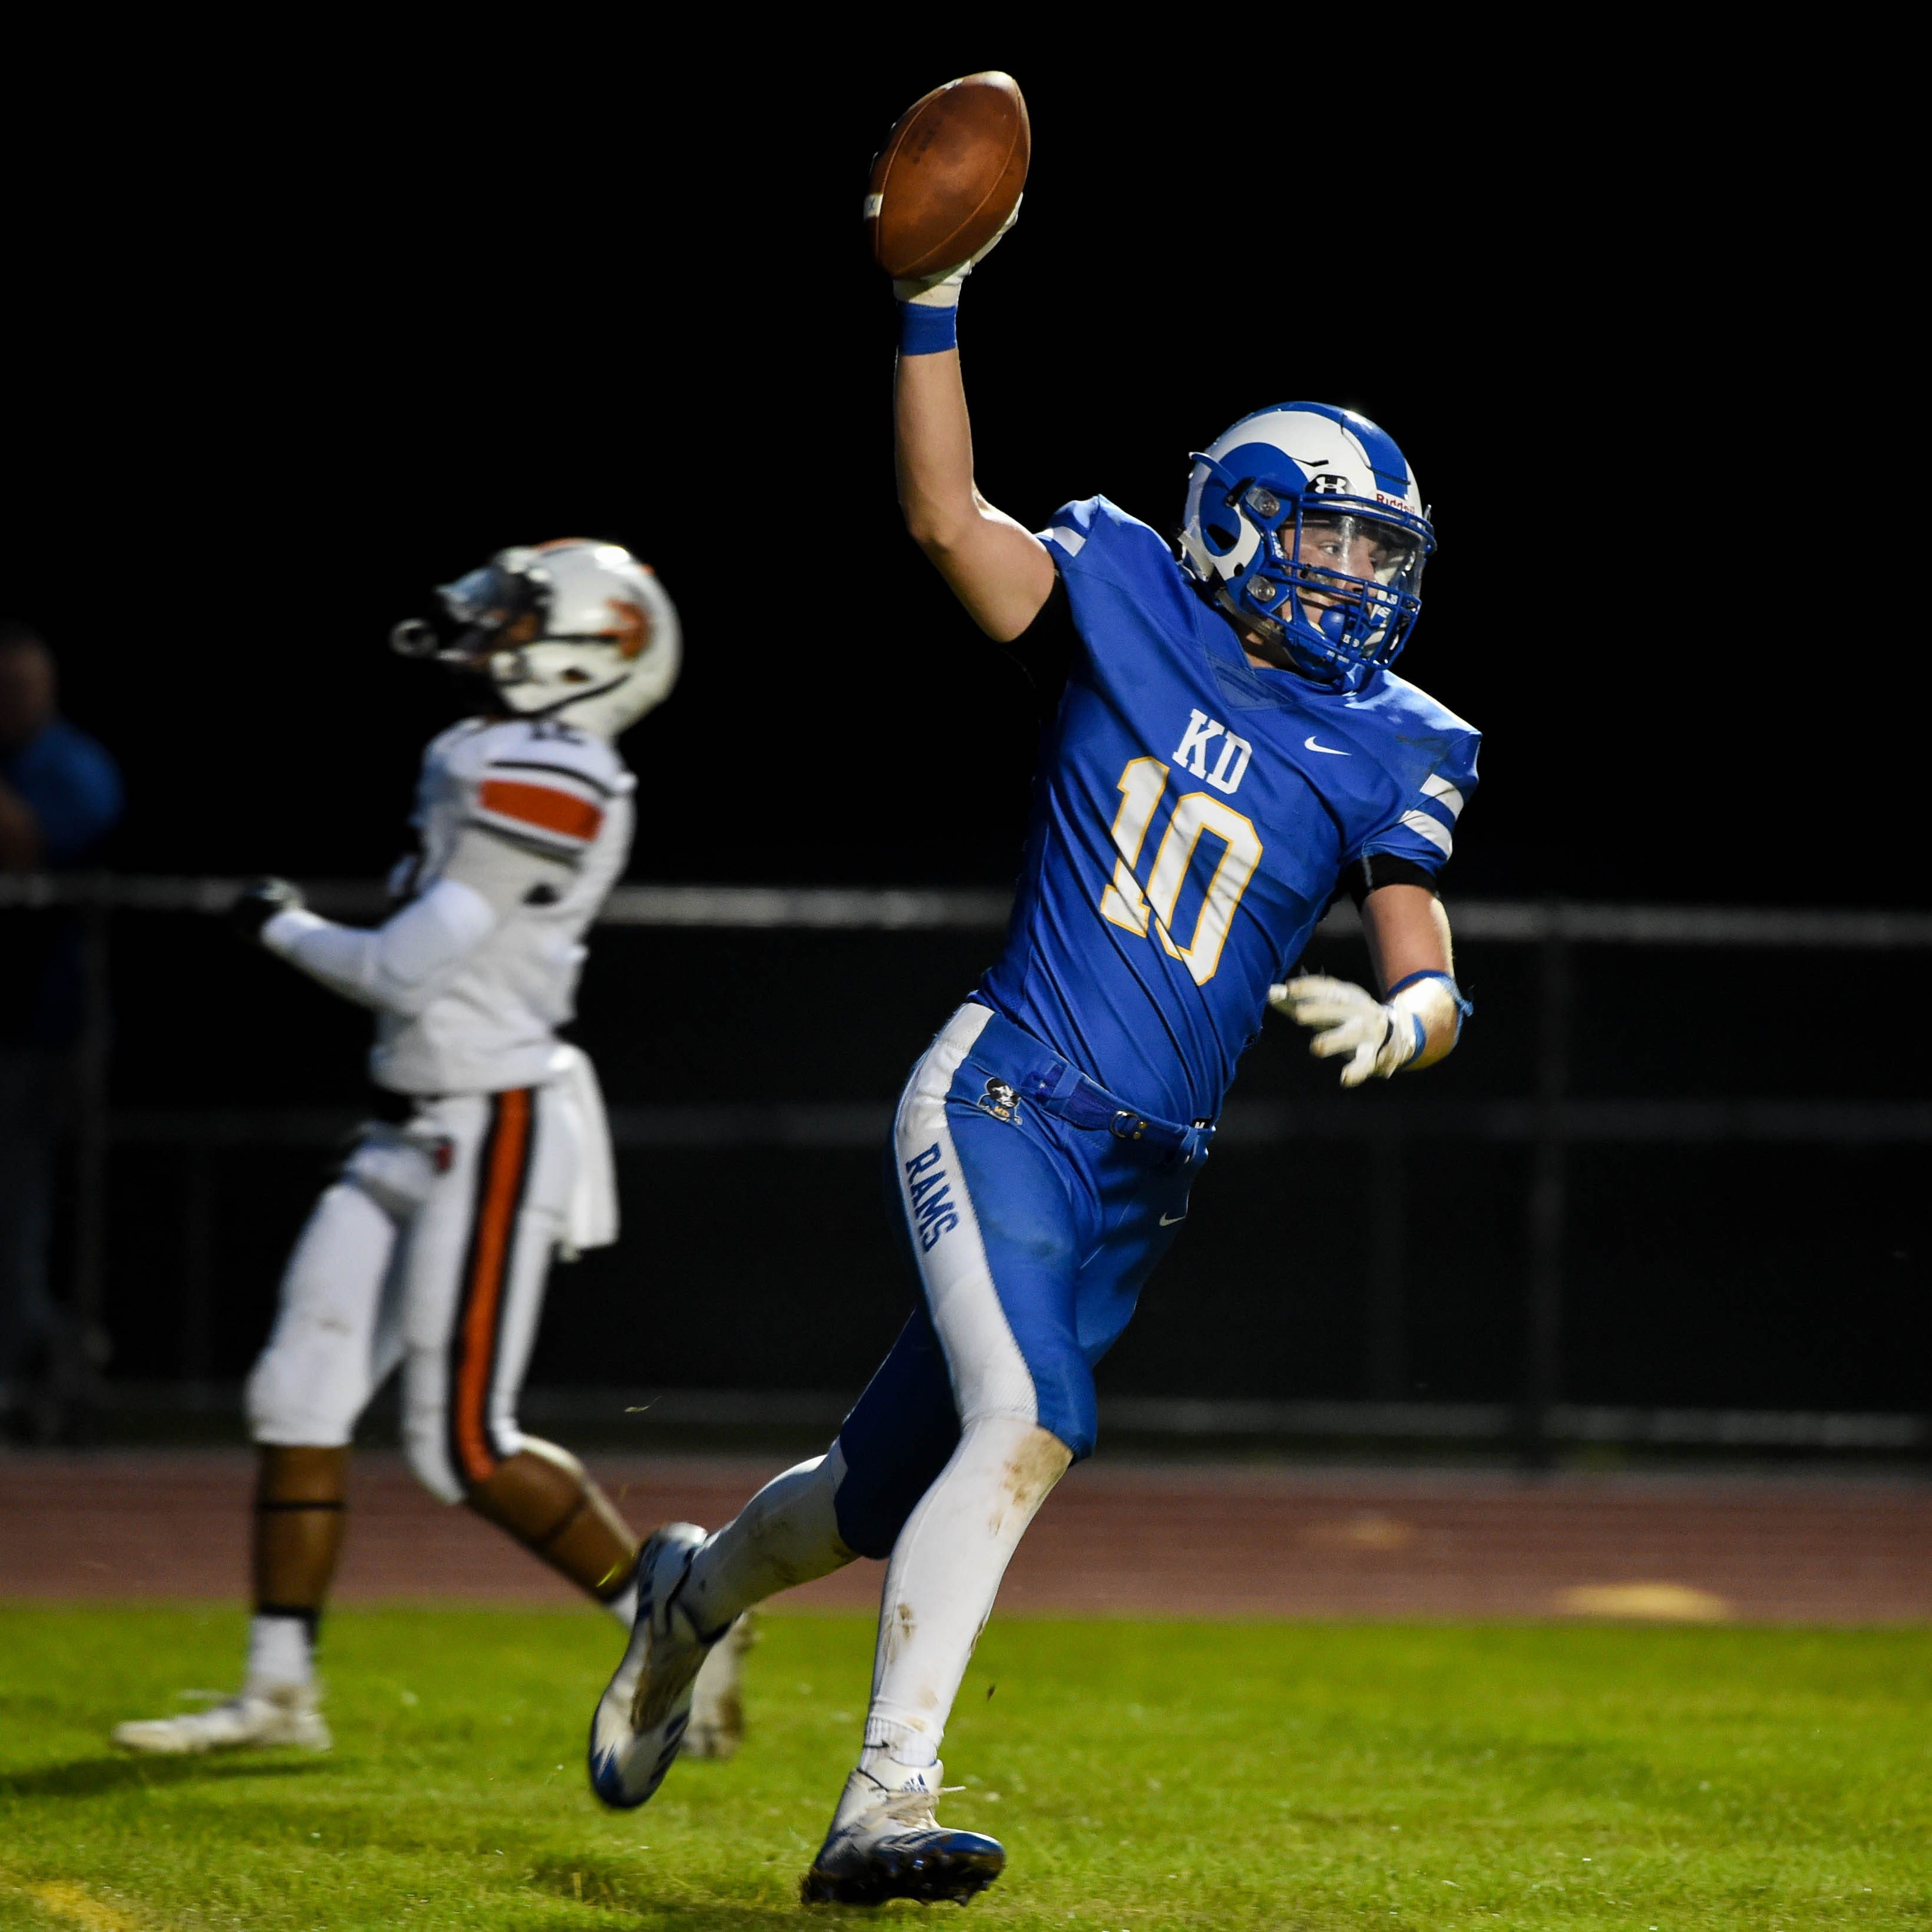 Live updates: District 3 high school football for Week 6, Sept. 28